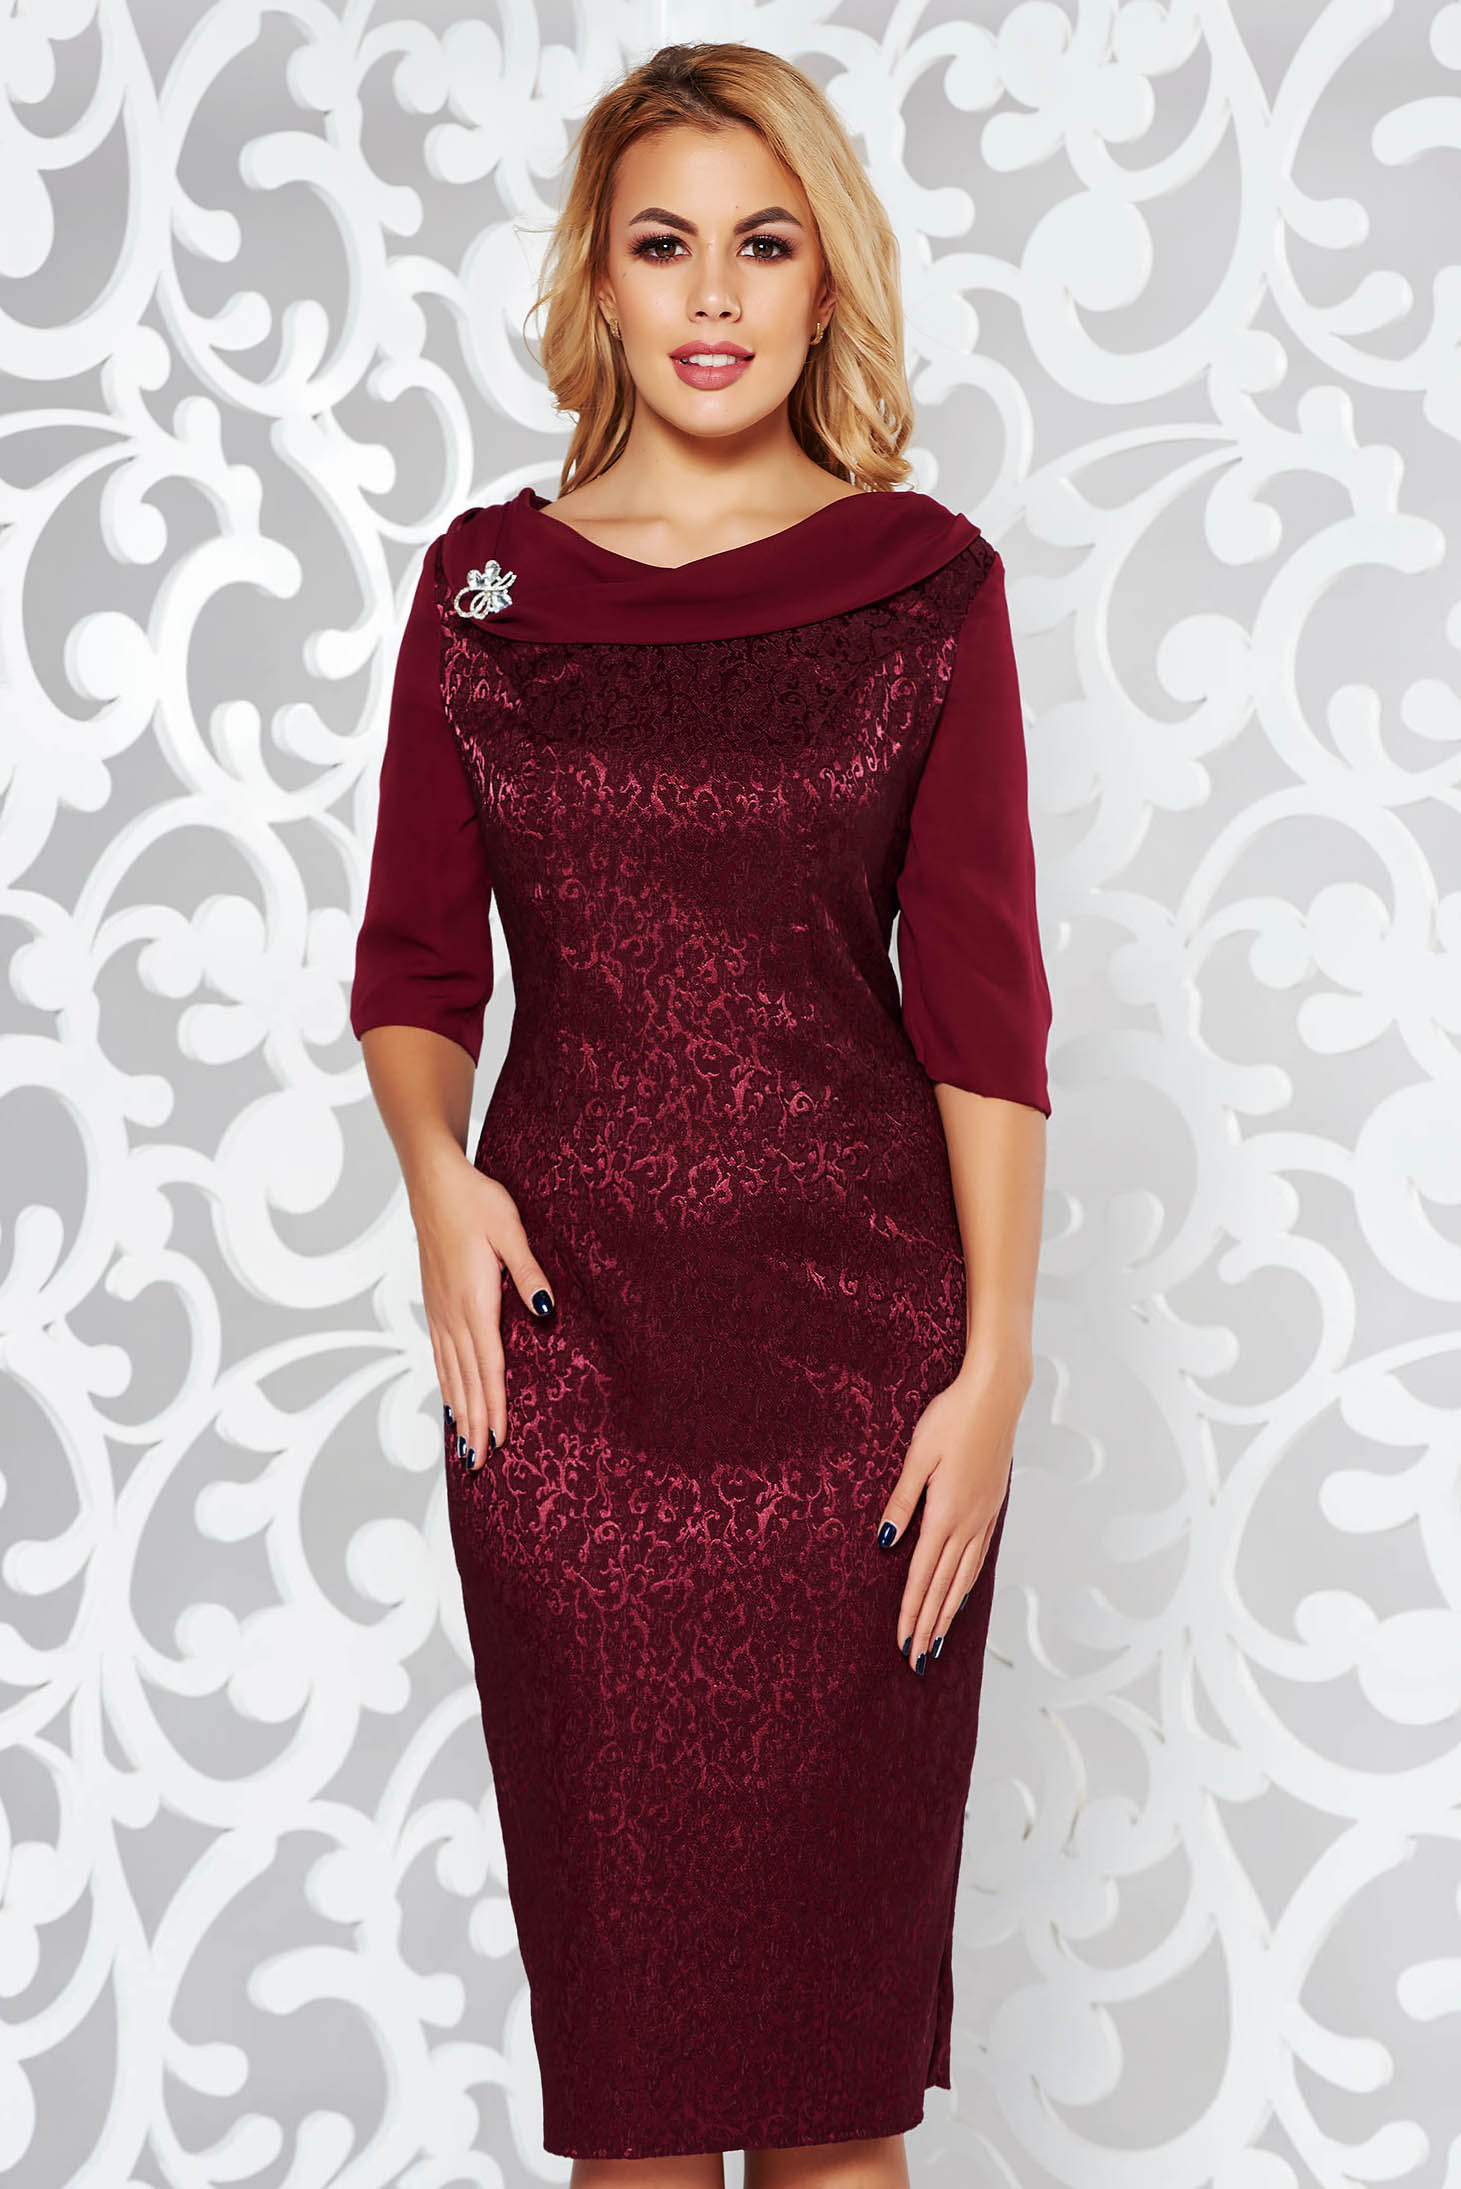 8e68061eb5f90 Burgundy elegant pencil dress slightly elastic fabric raised pattern